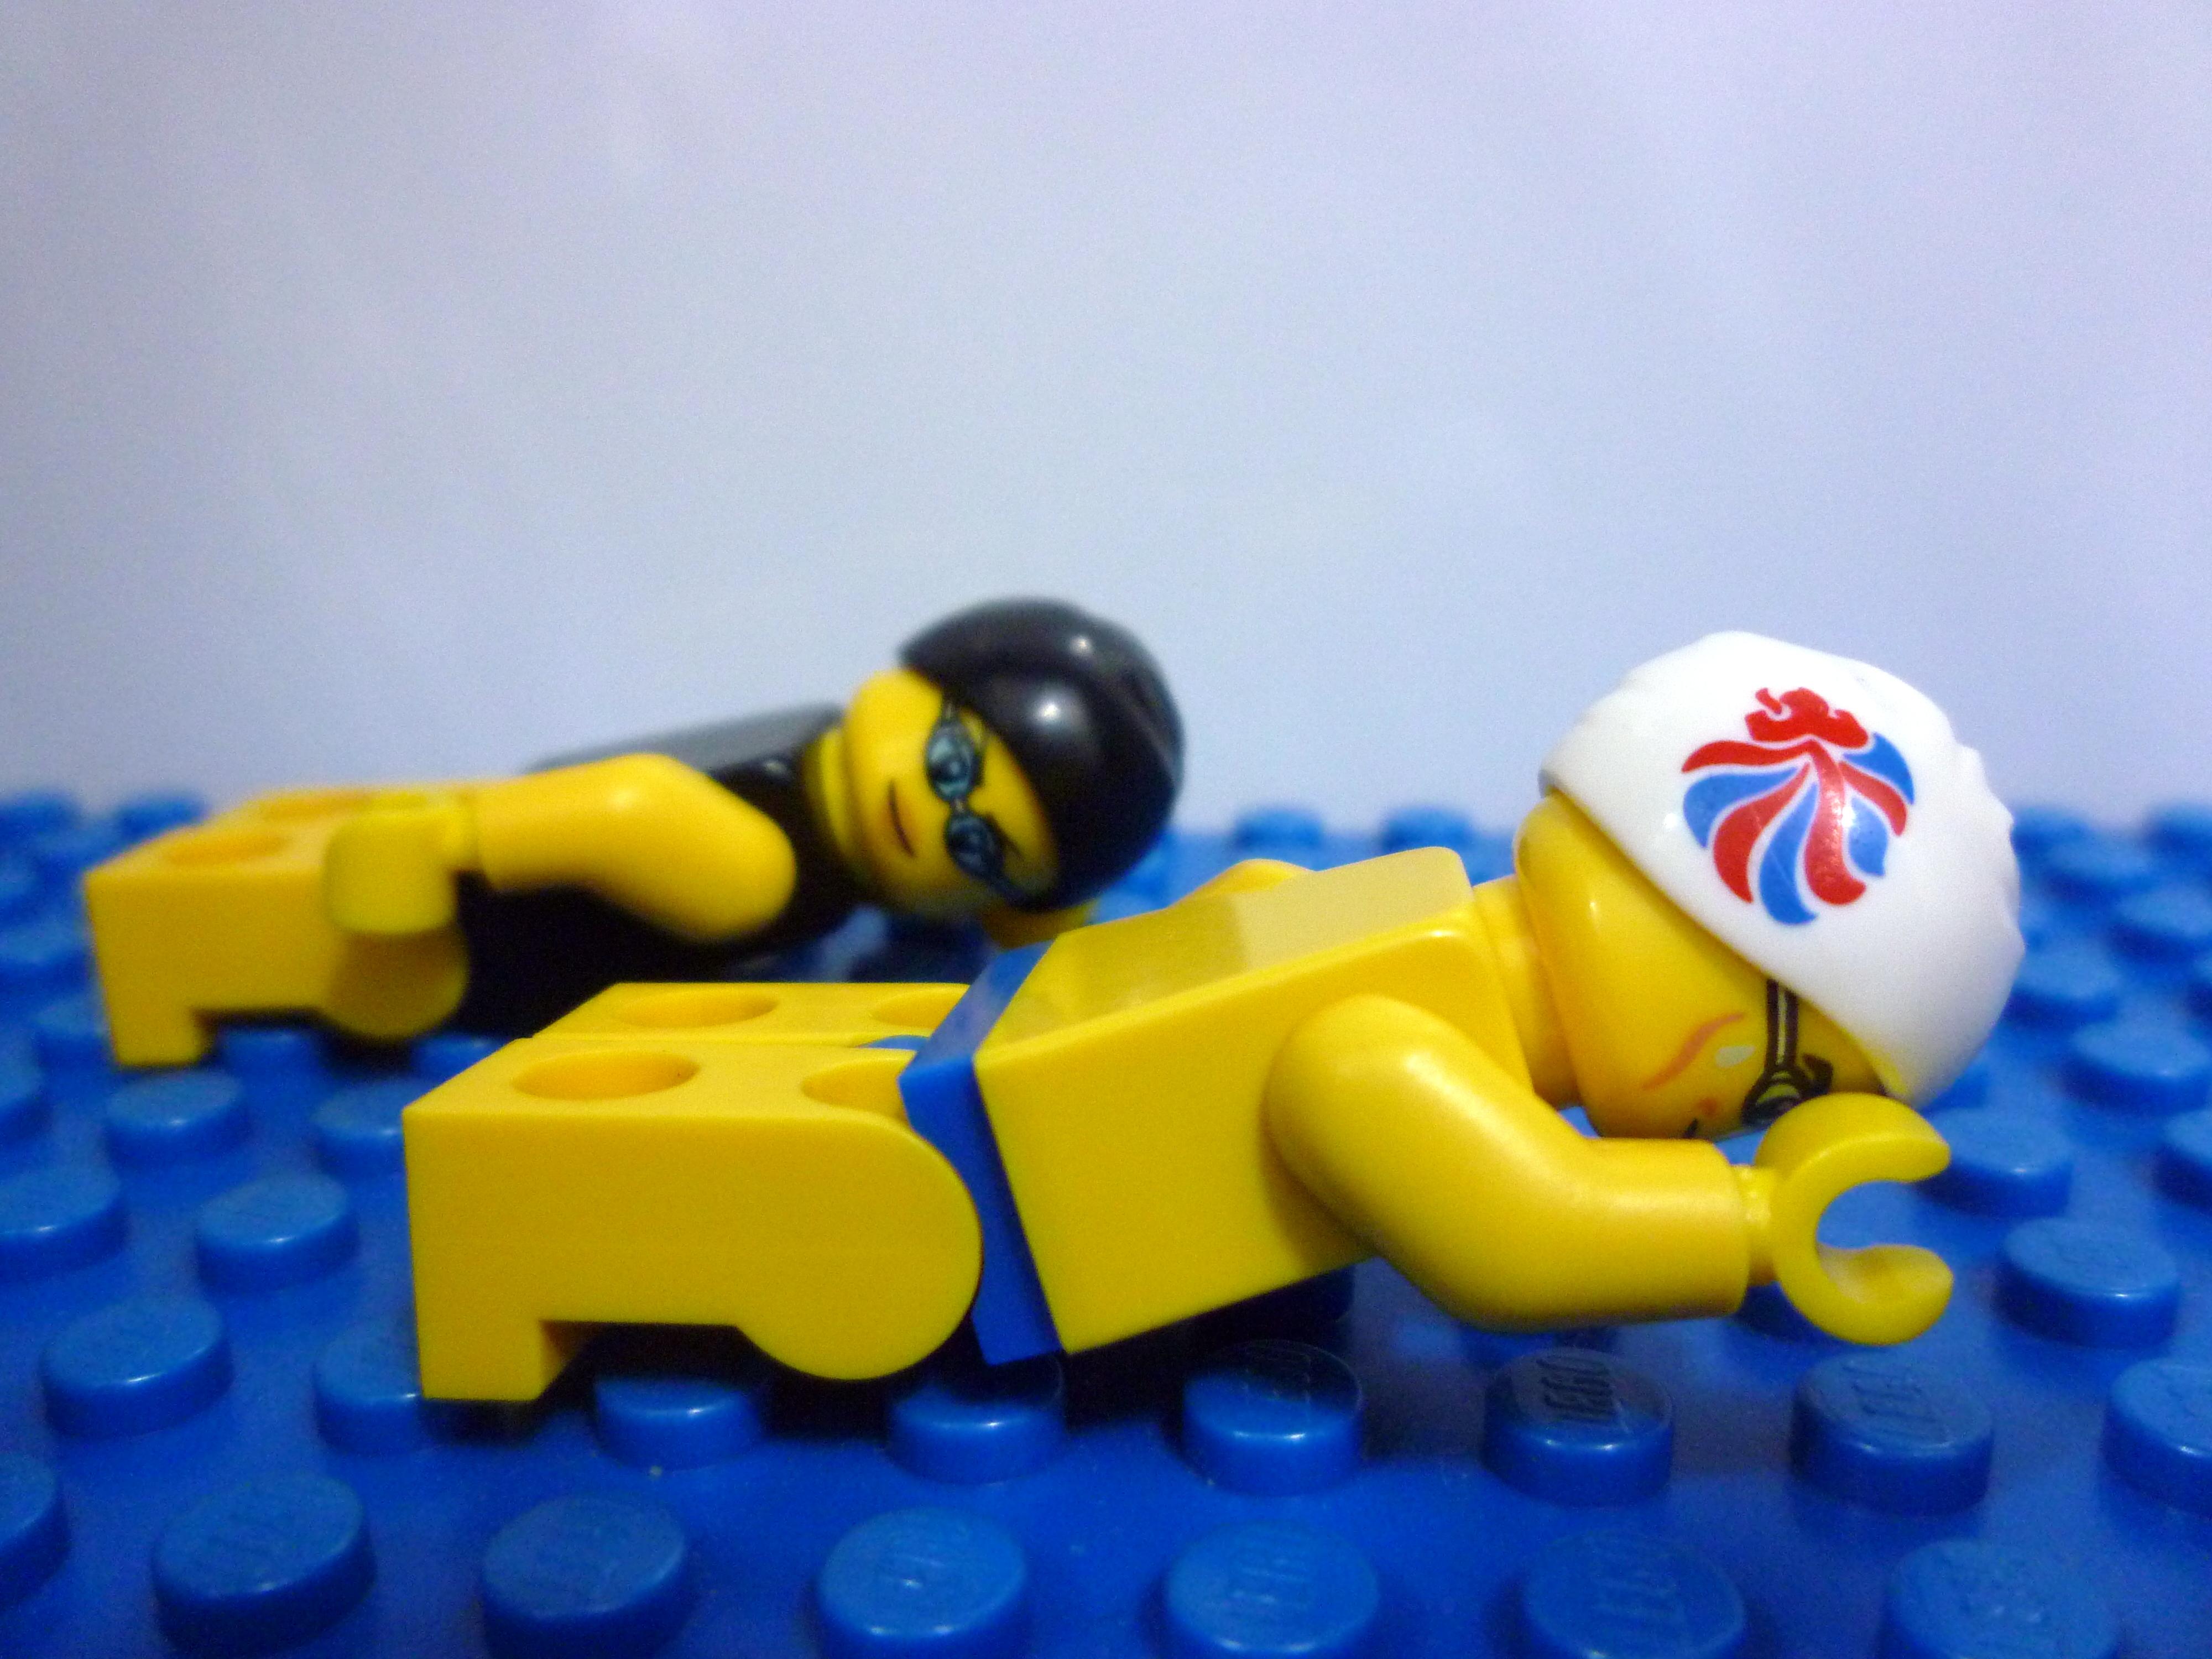 Lego Team Gb Minifigures Review